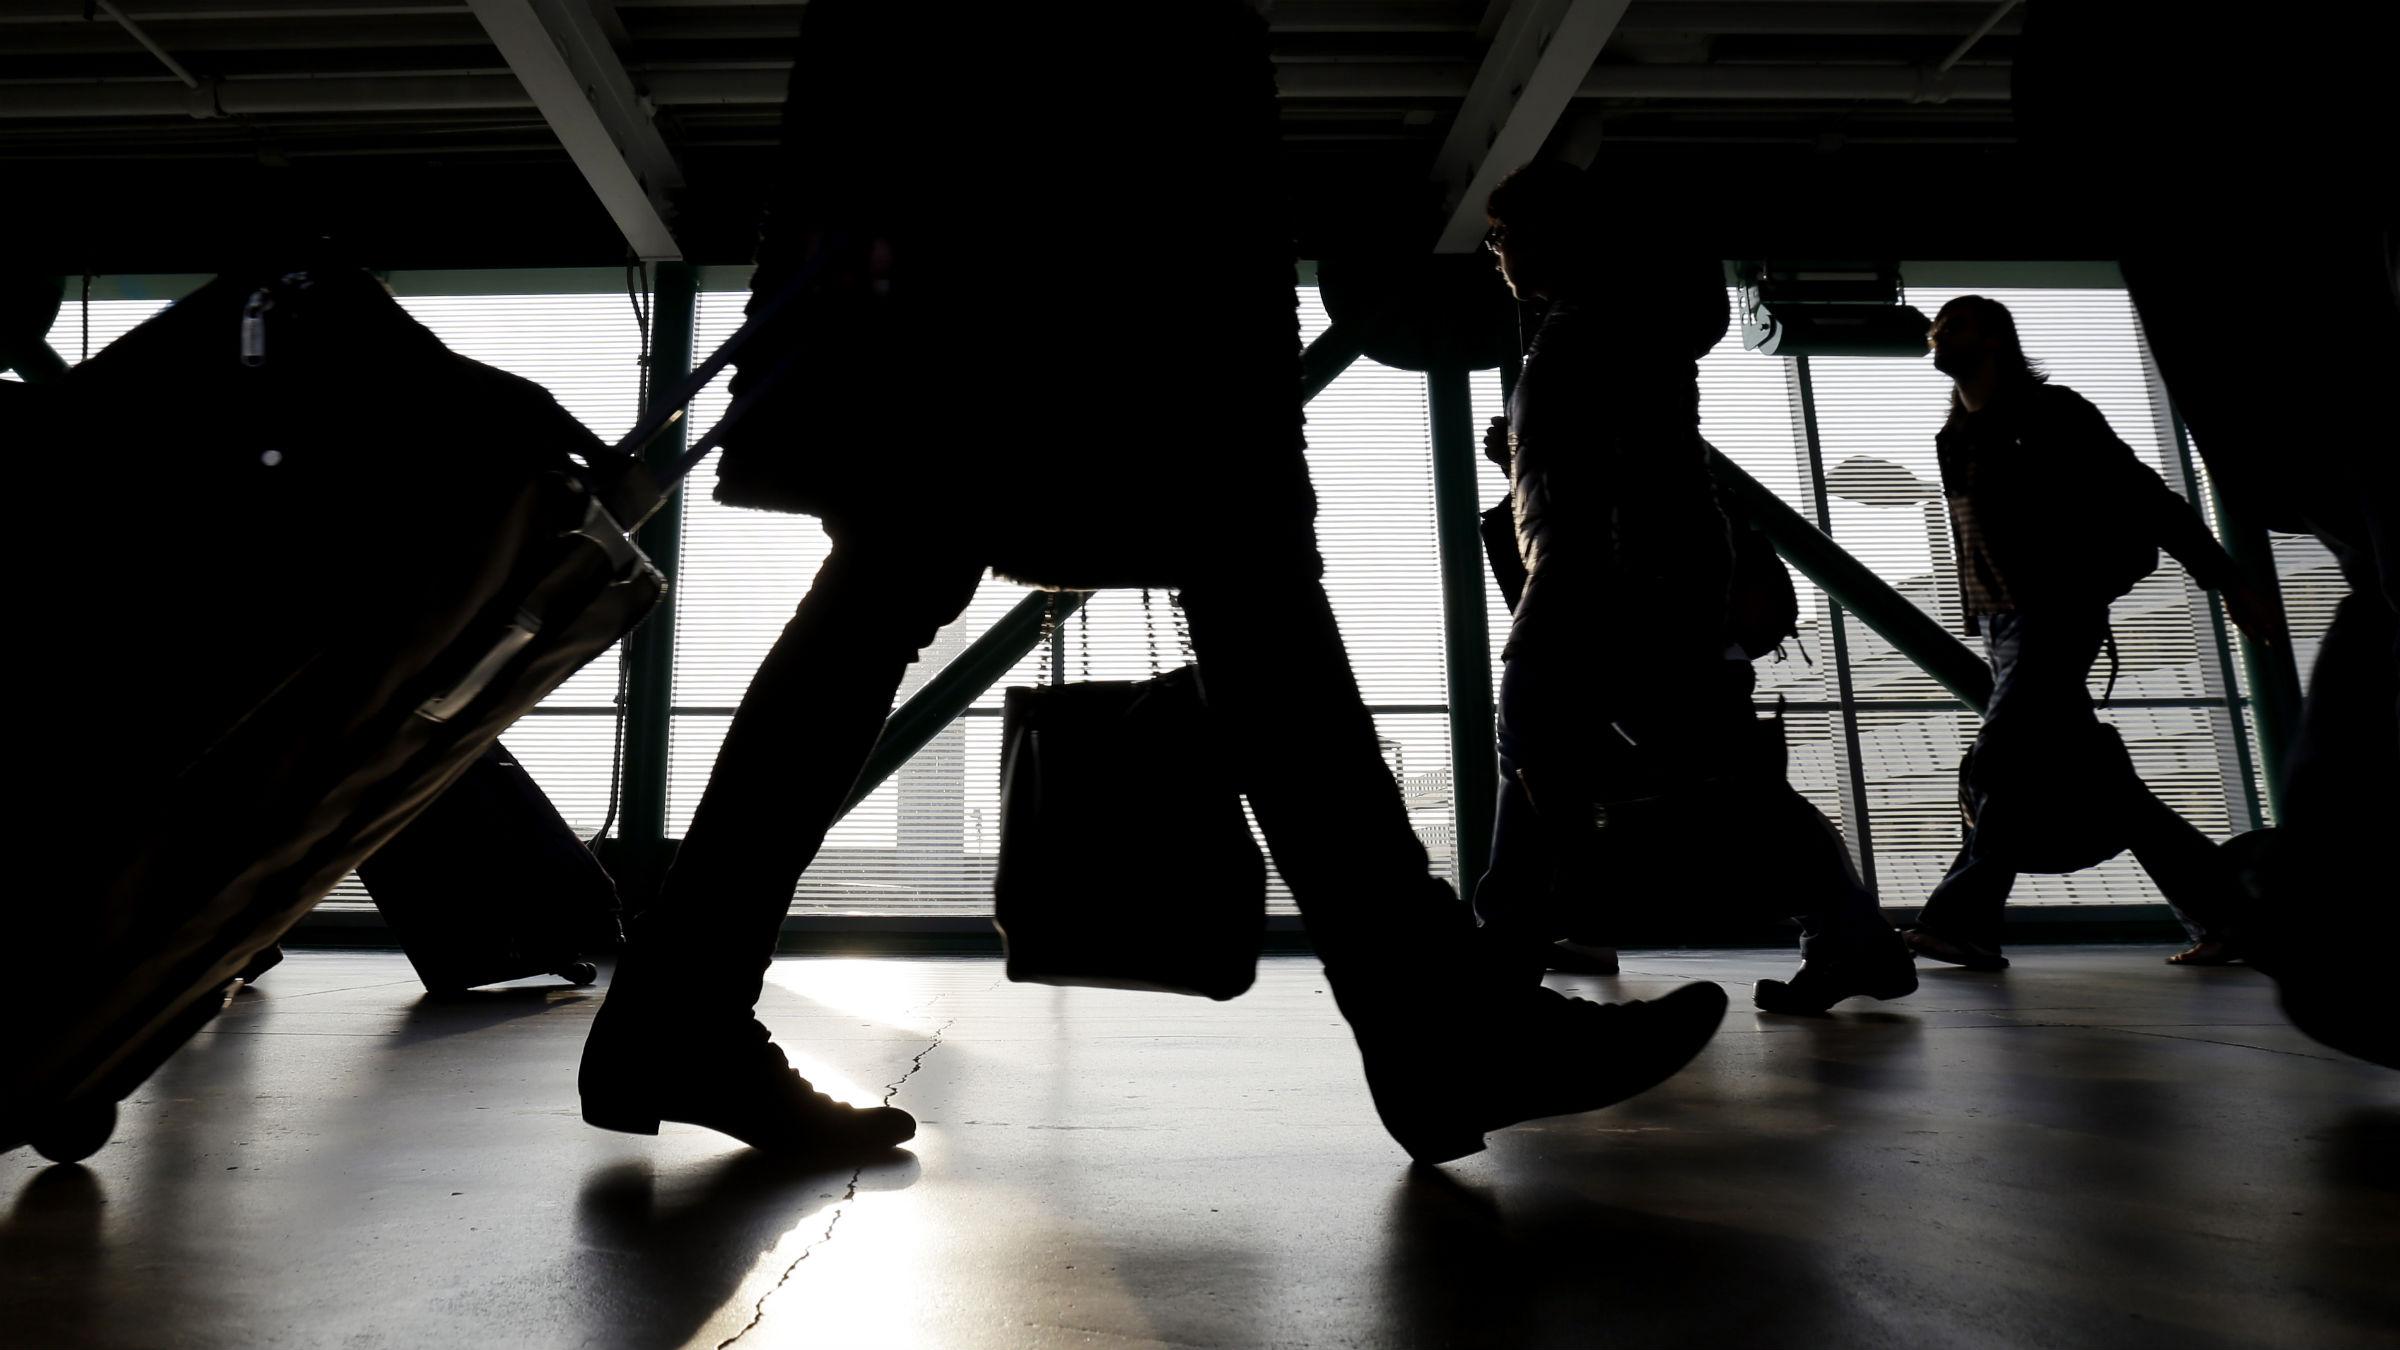 Silhouette of people walking in airport